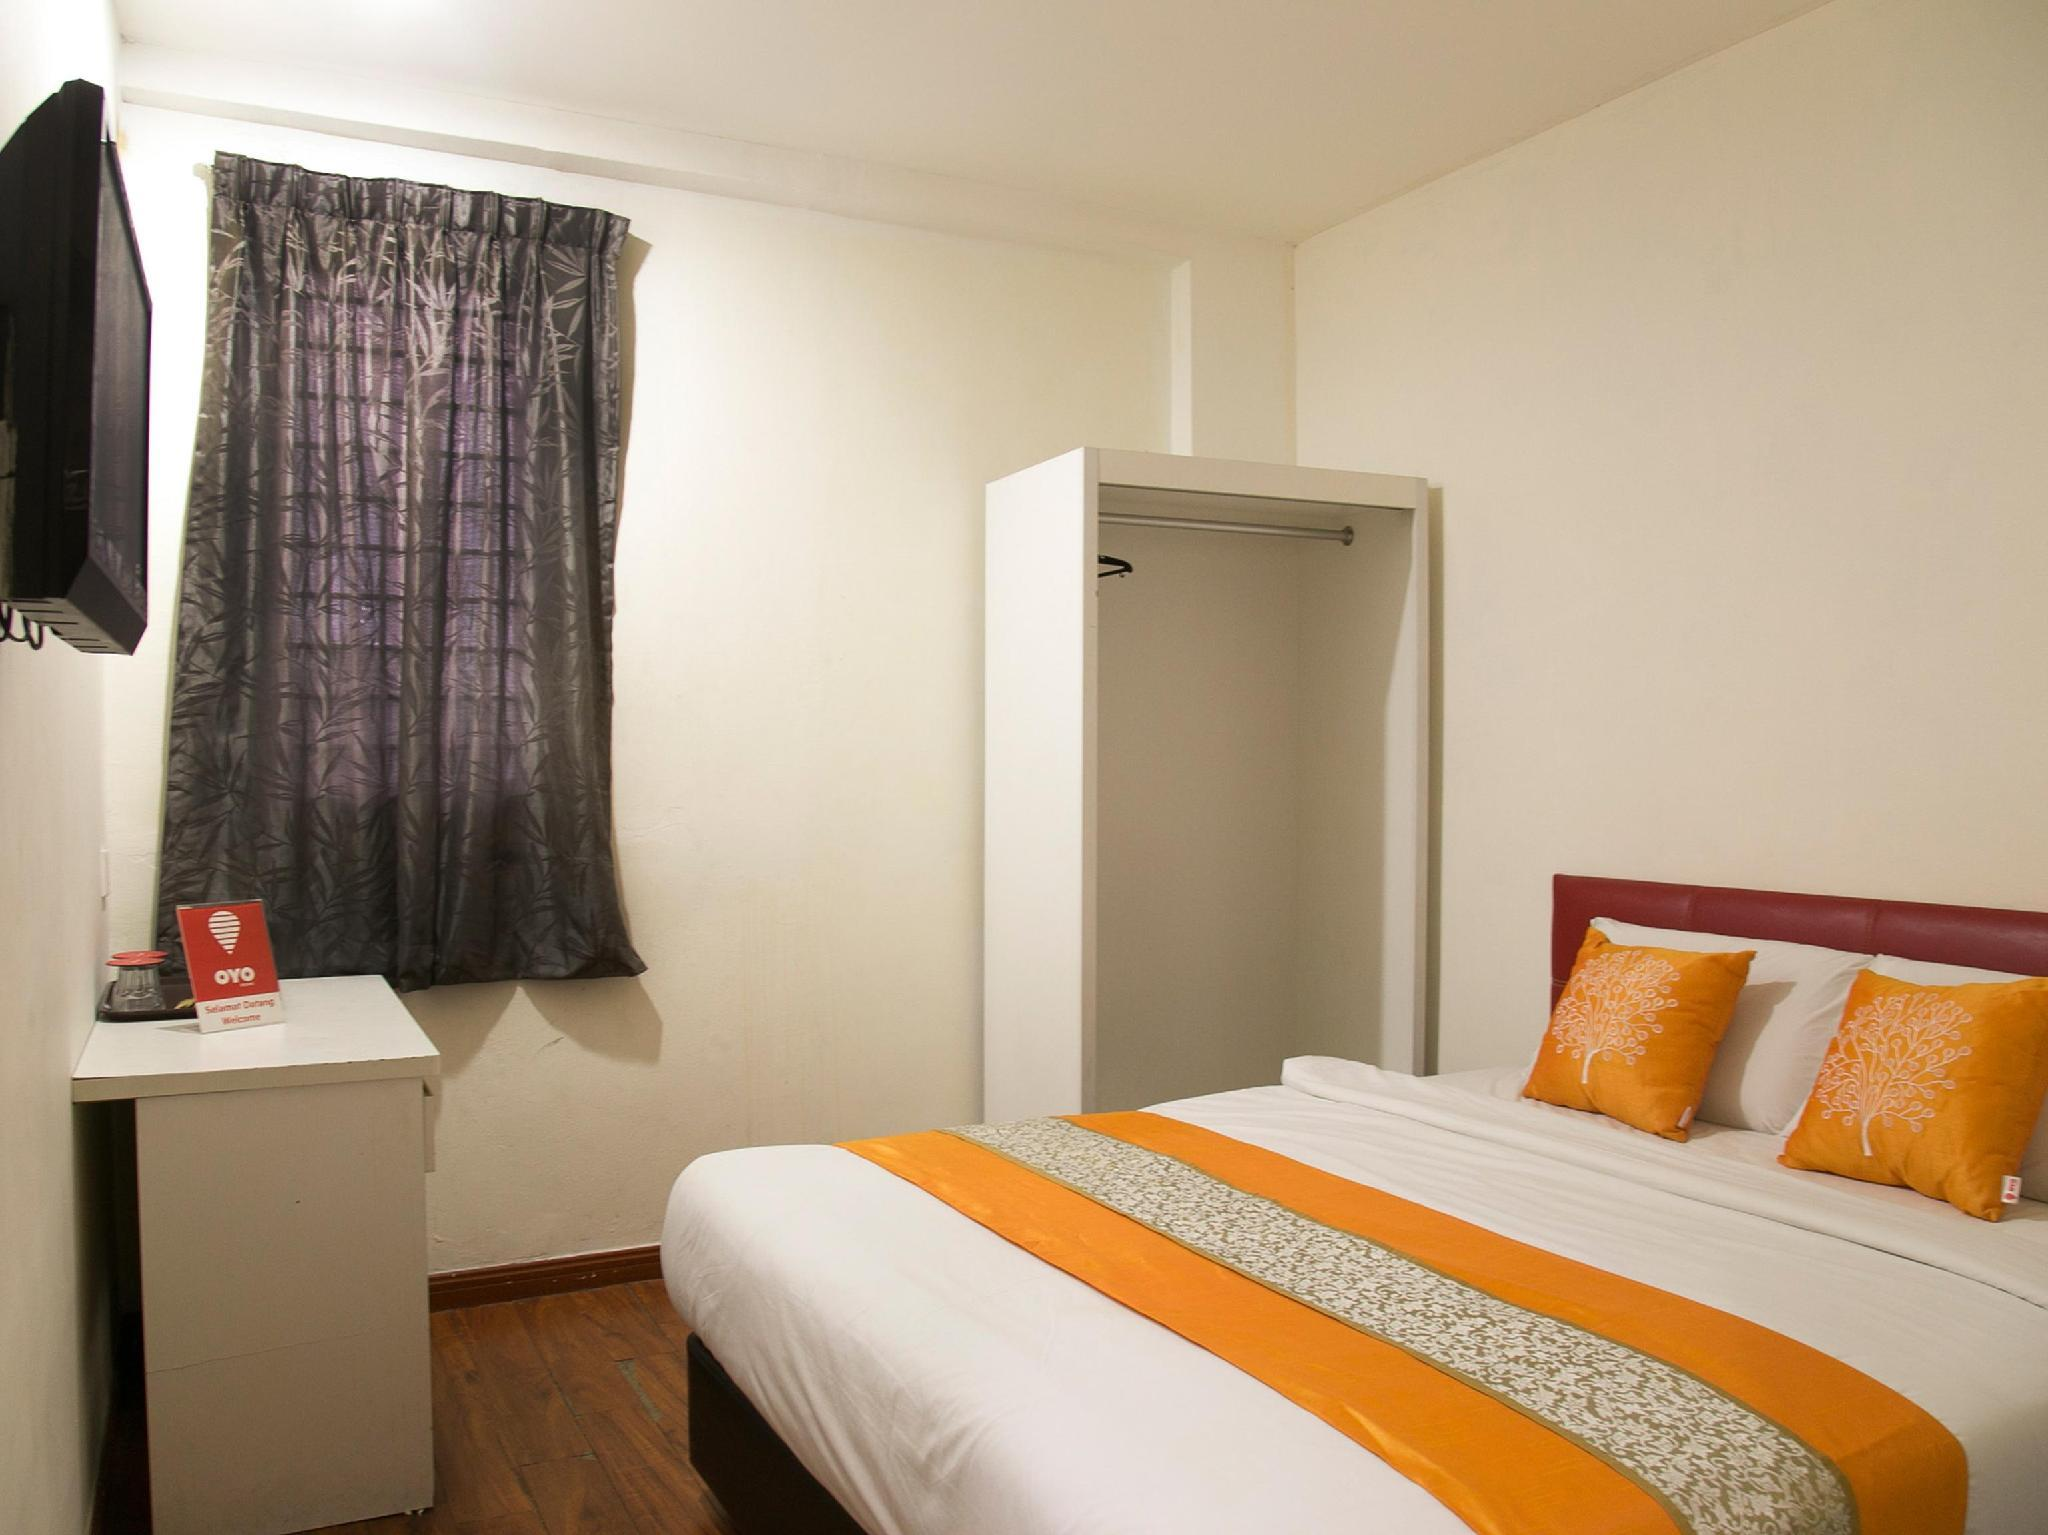 OYO 143 Swan Cottage Hotel, Kuala Lumpur